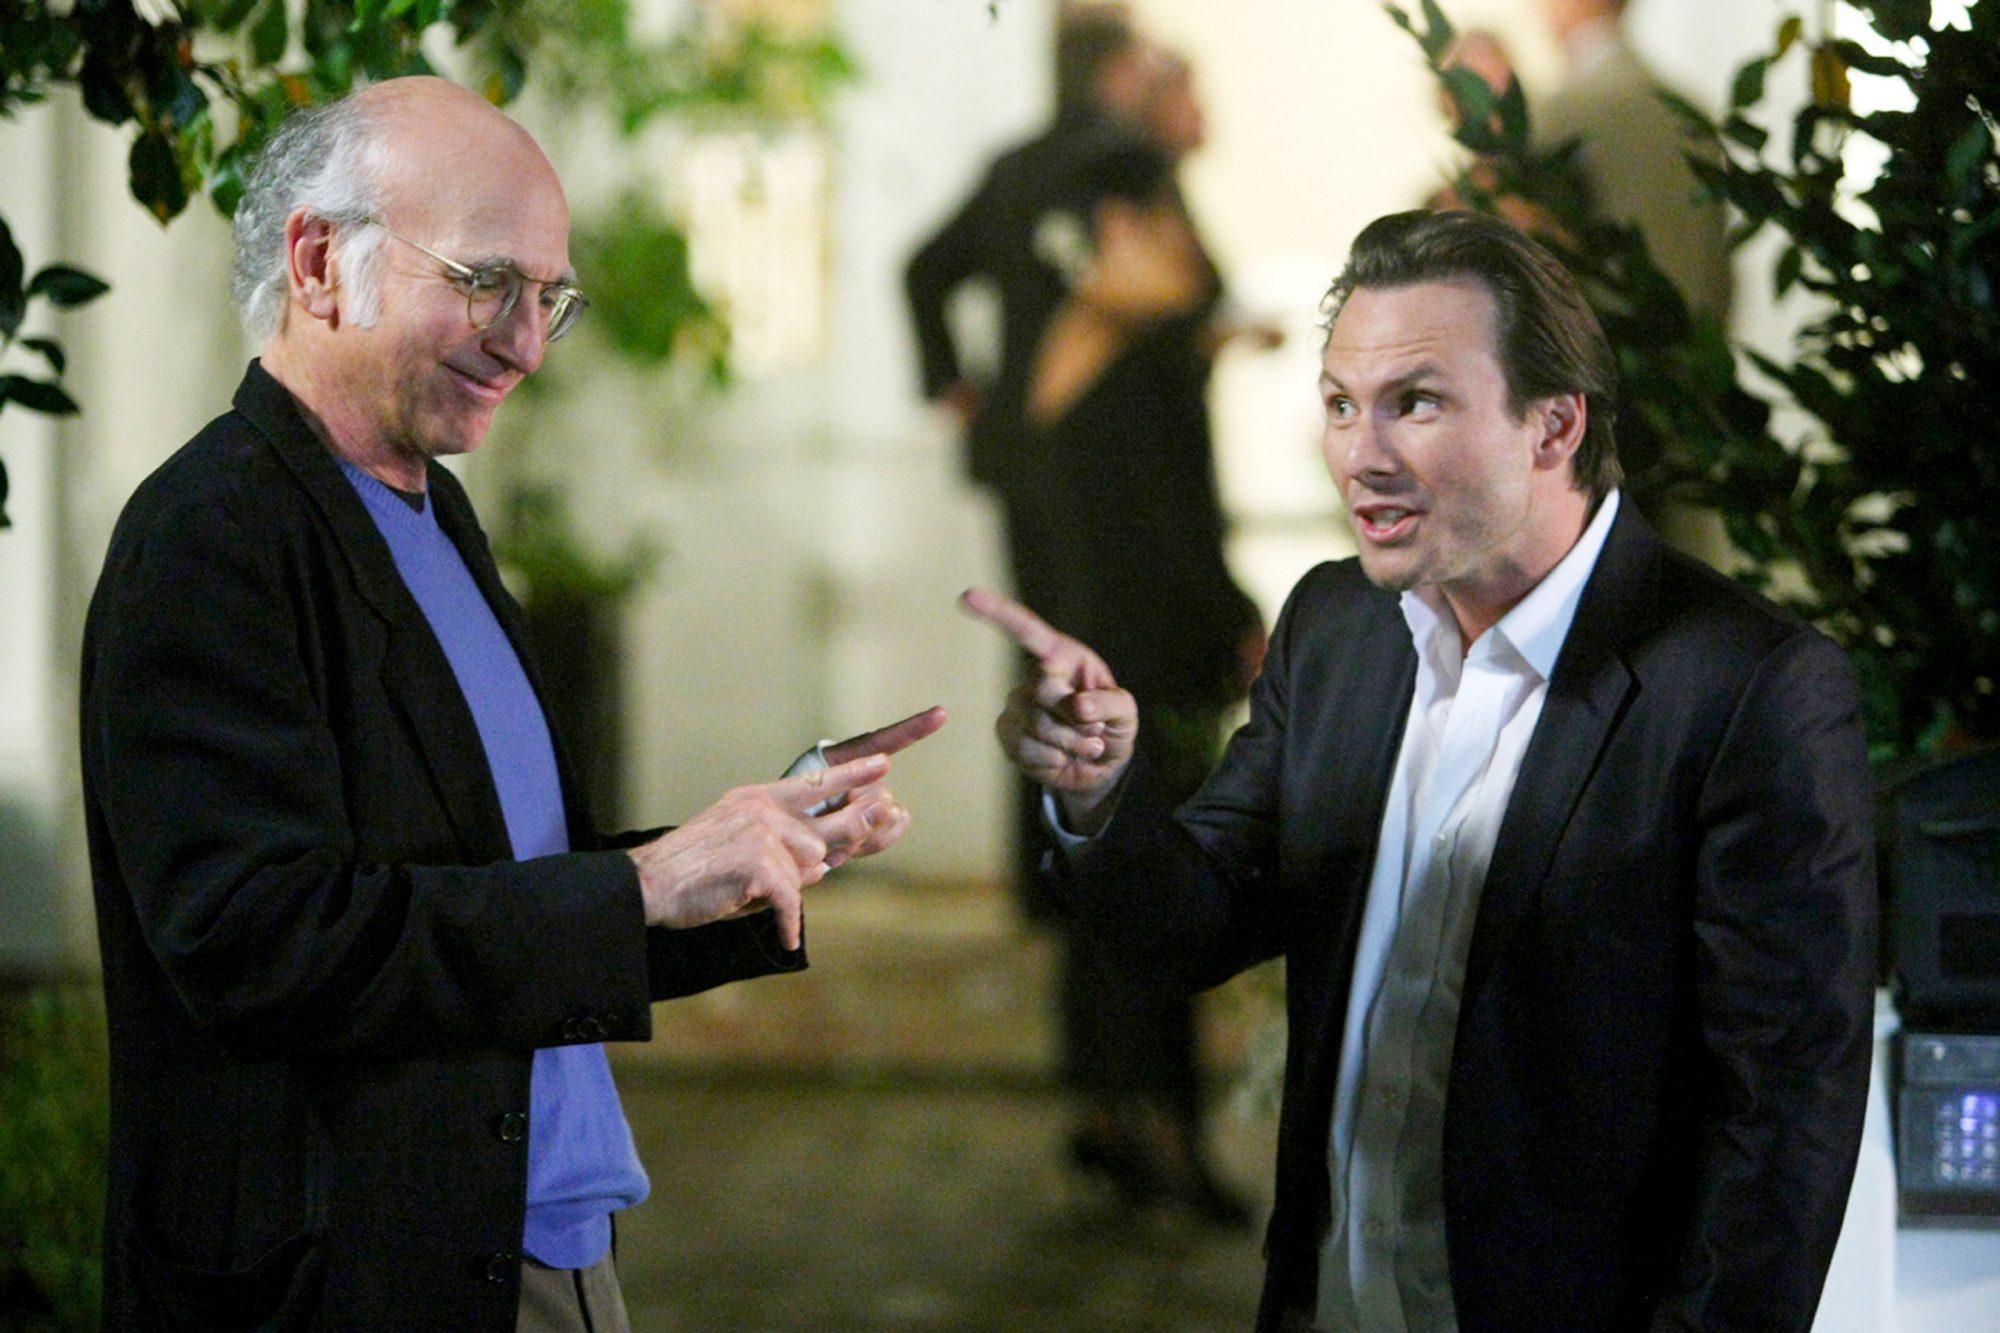 CURB YOUR ENTHUSIASM: Larry David, Christian Slater. photo: Doug Hyun